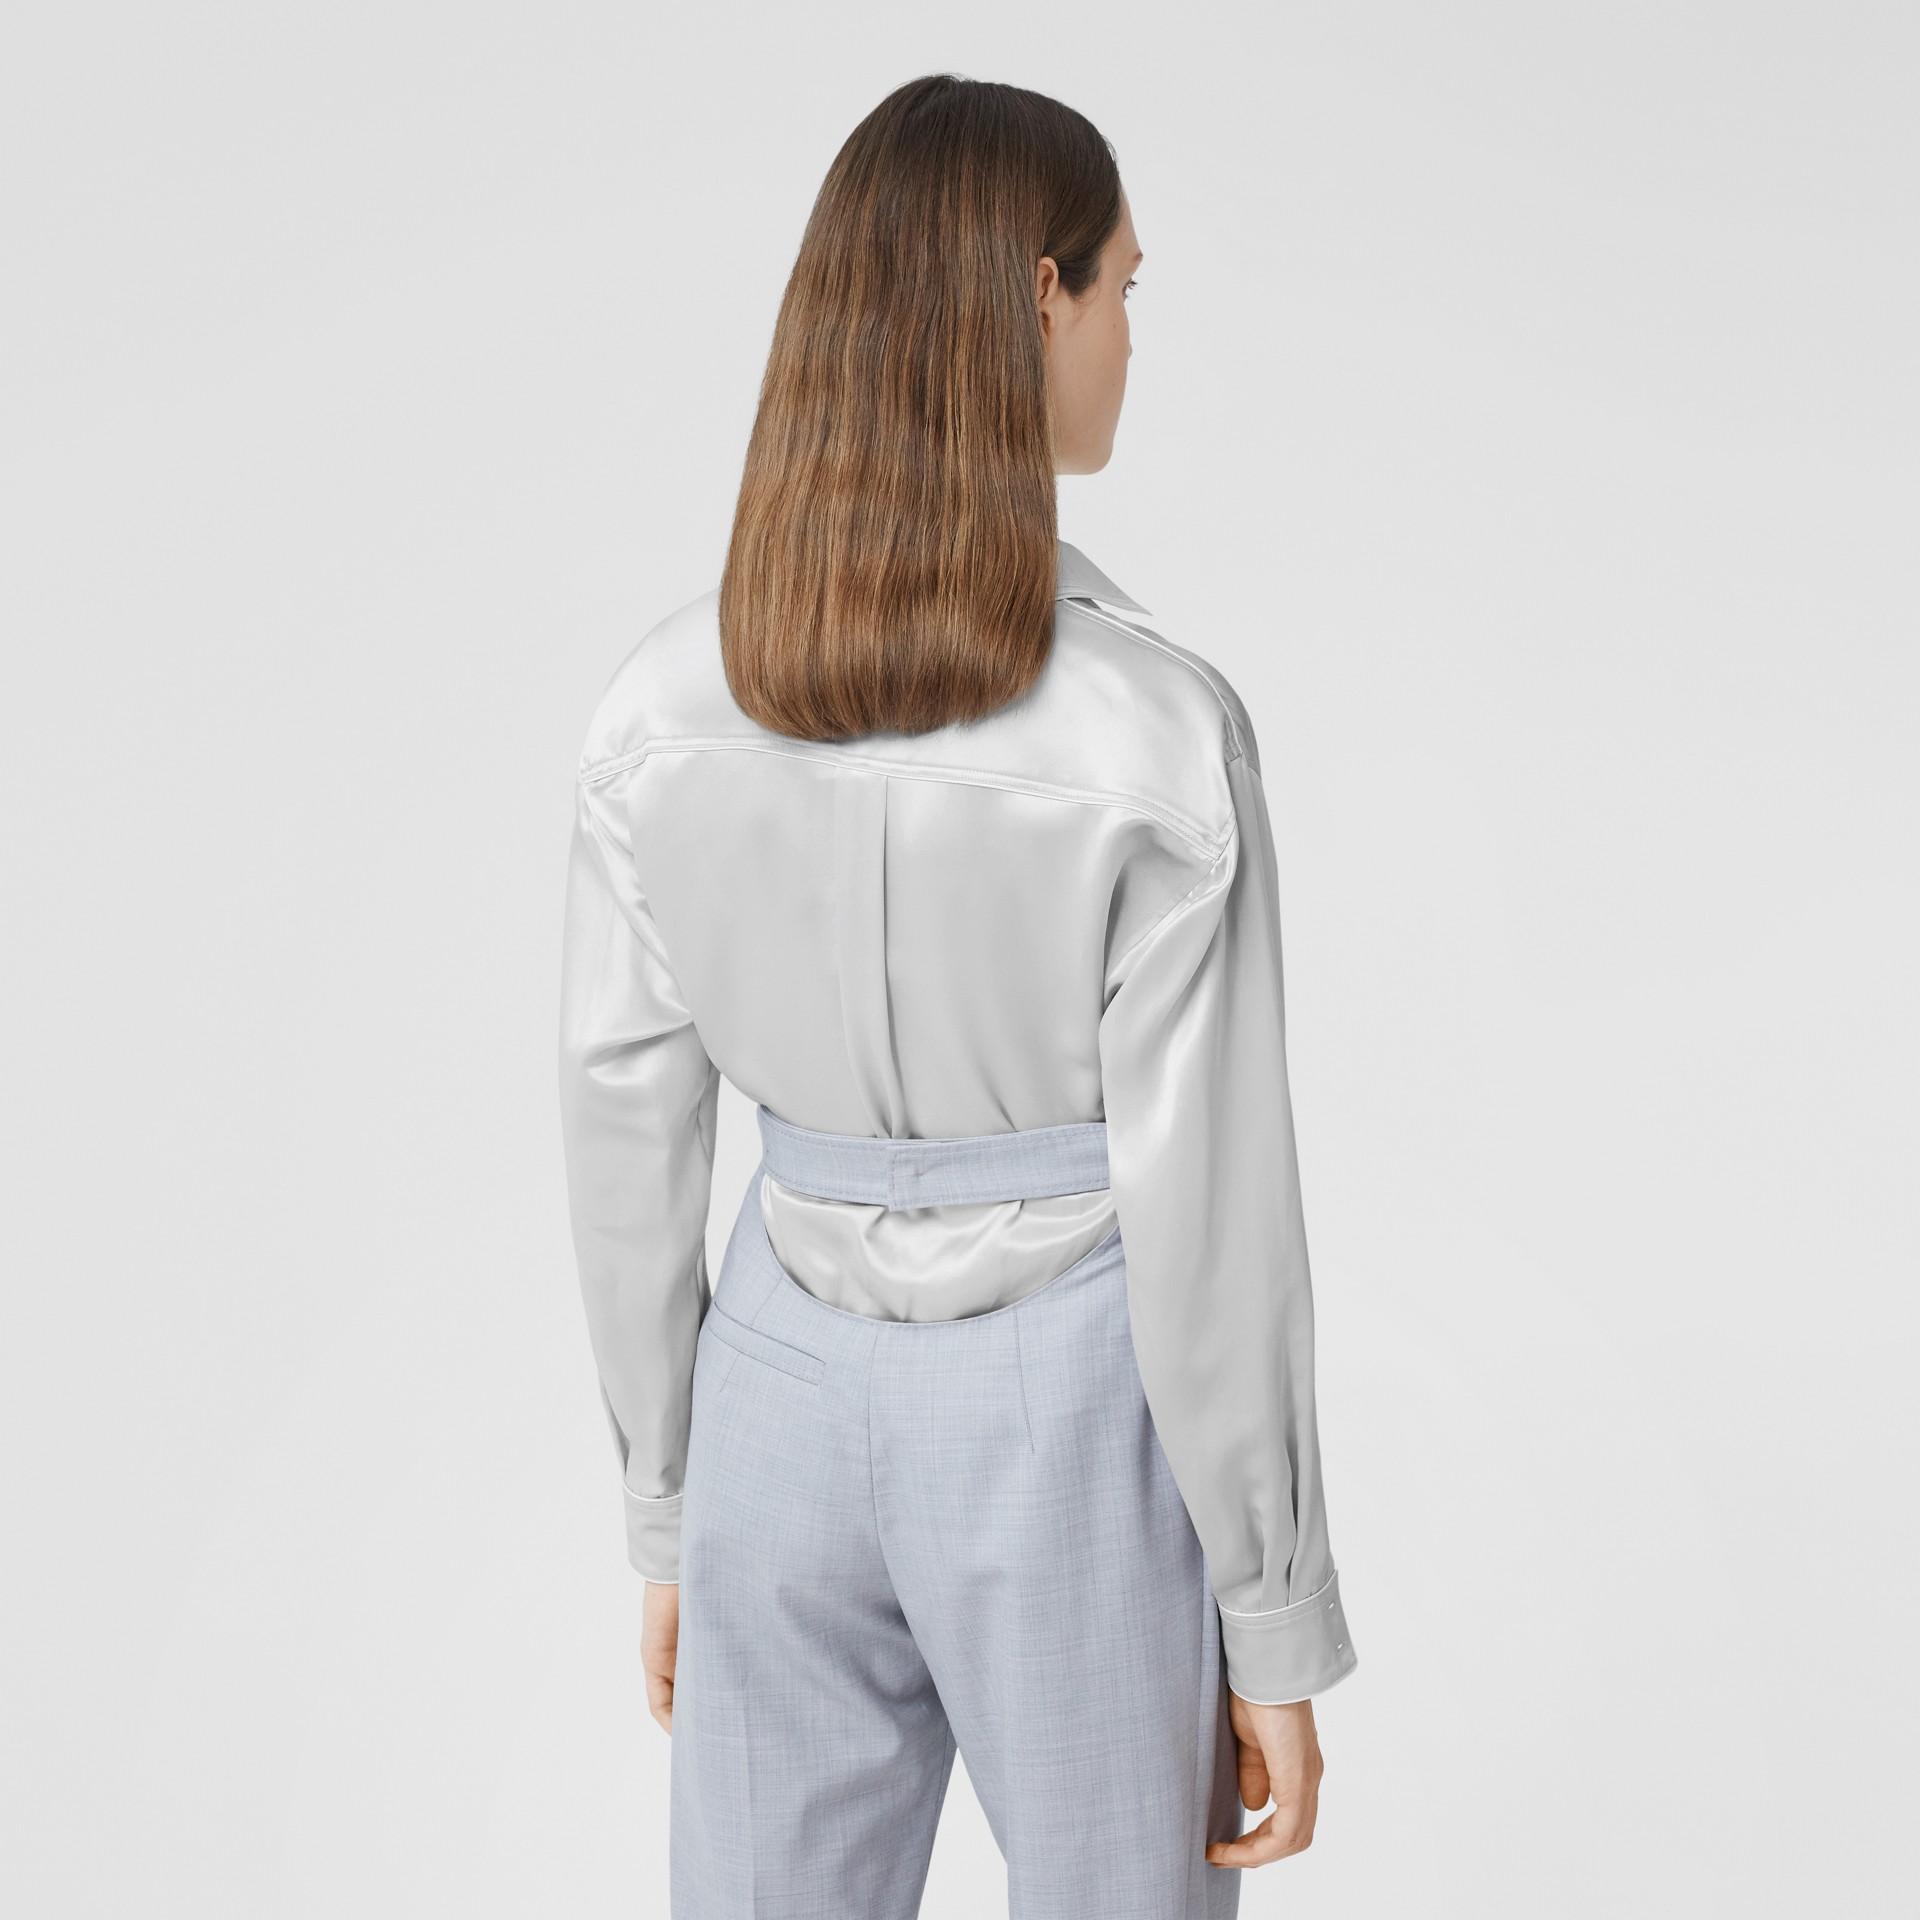 Silk Satin Shirt in Light Pebble Grey - Women | Burberry - gallery image 2